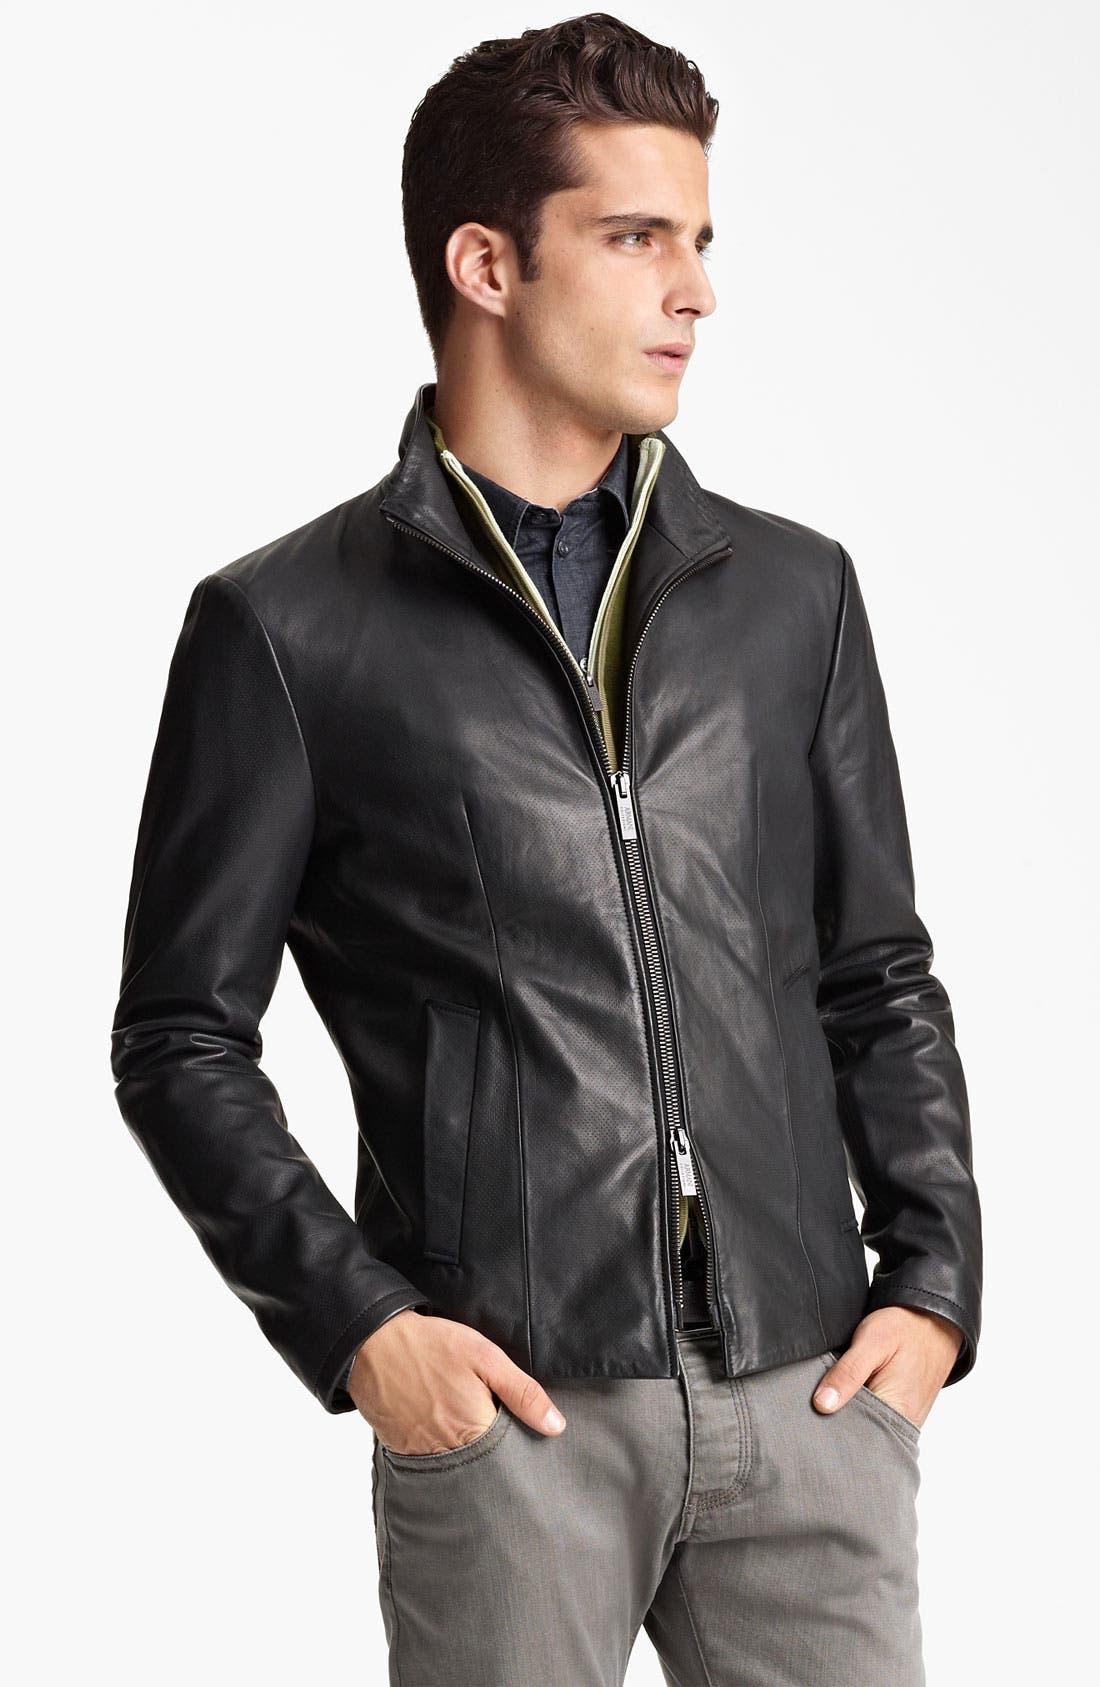 Alternate Image 1 Selected - Armani Collezioni Perforated Leather Jacket